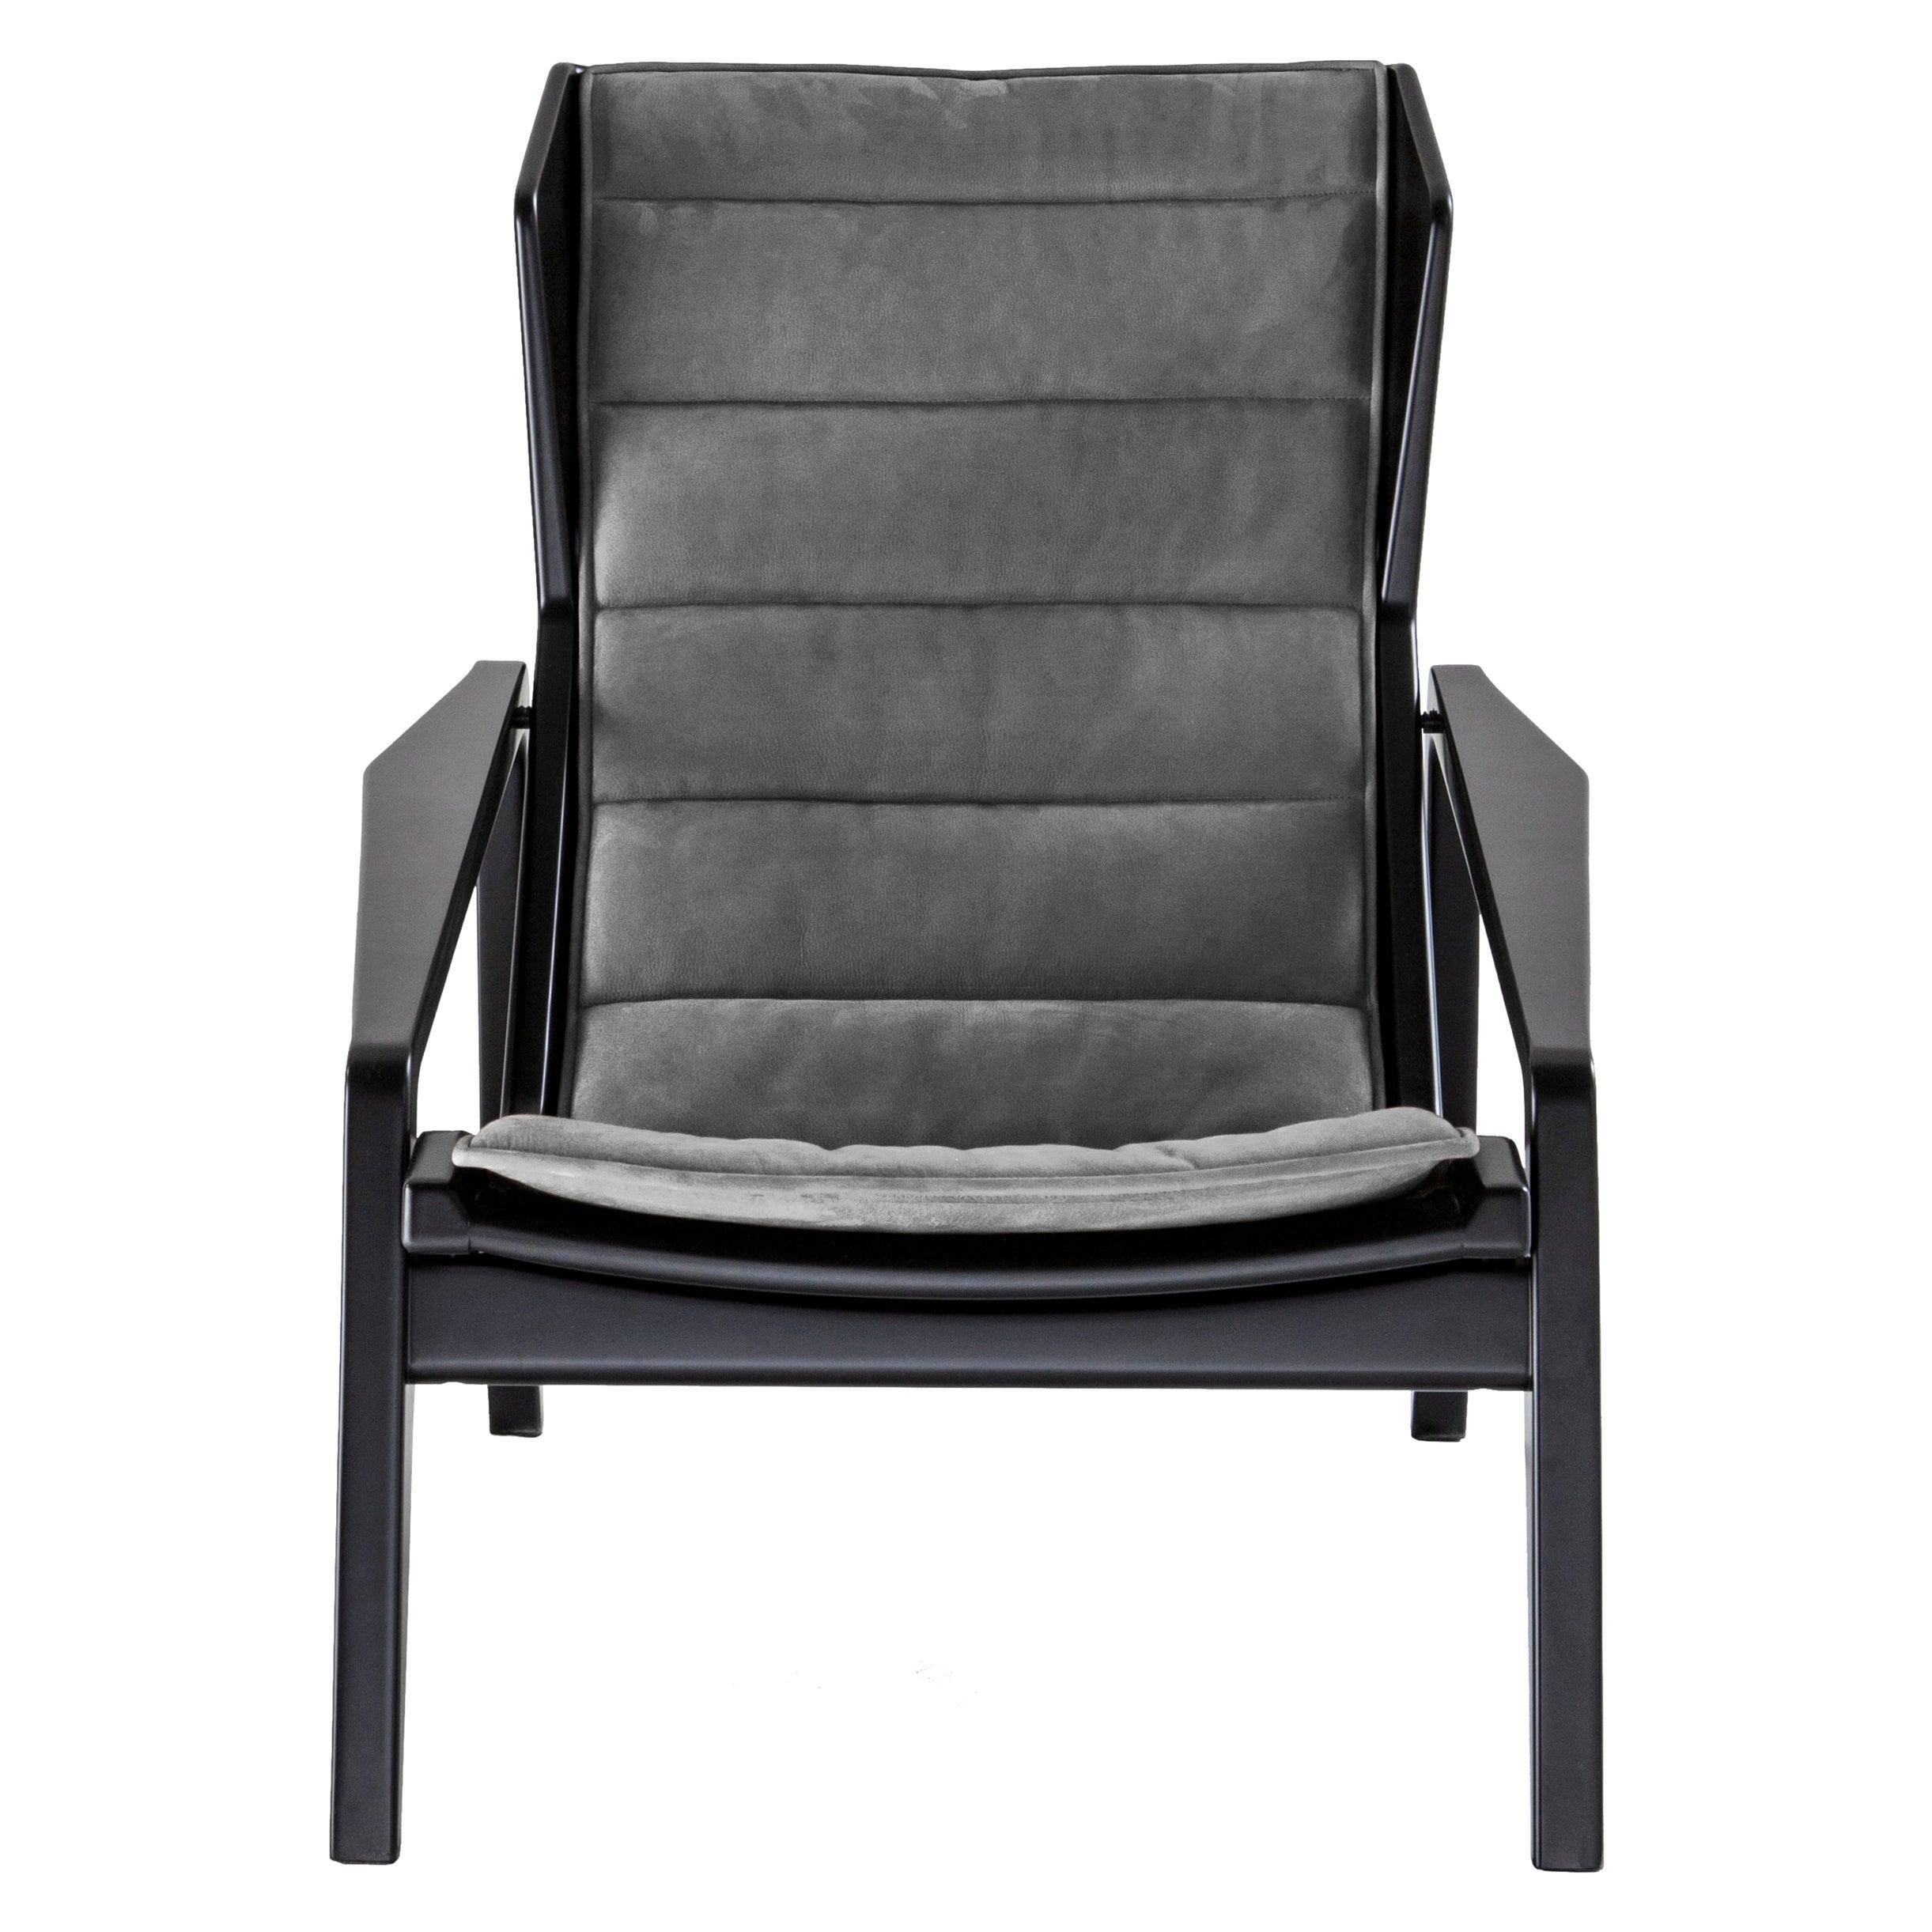 Molteni&C D.156.3 Armchair in Glossy Black Lacquered Wood & Chenille, Gio Ponti